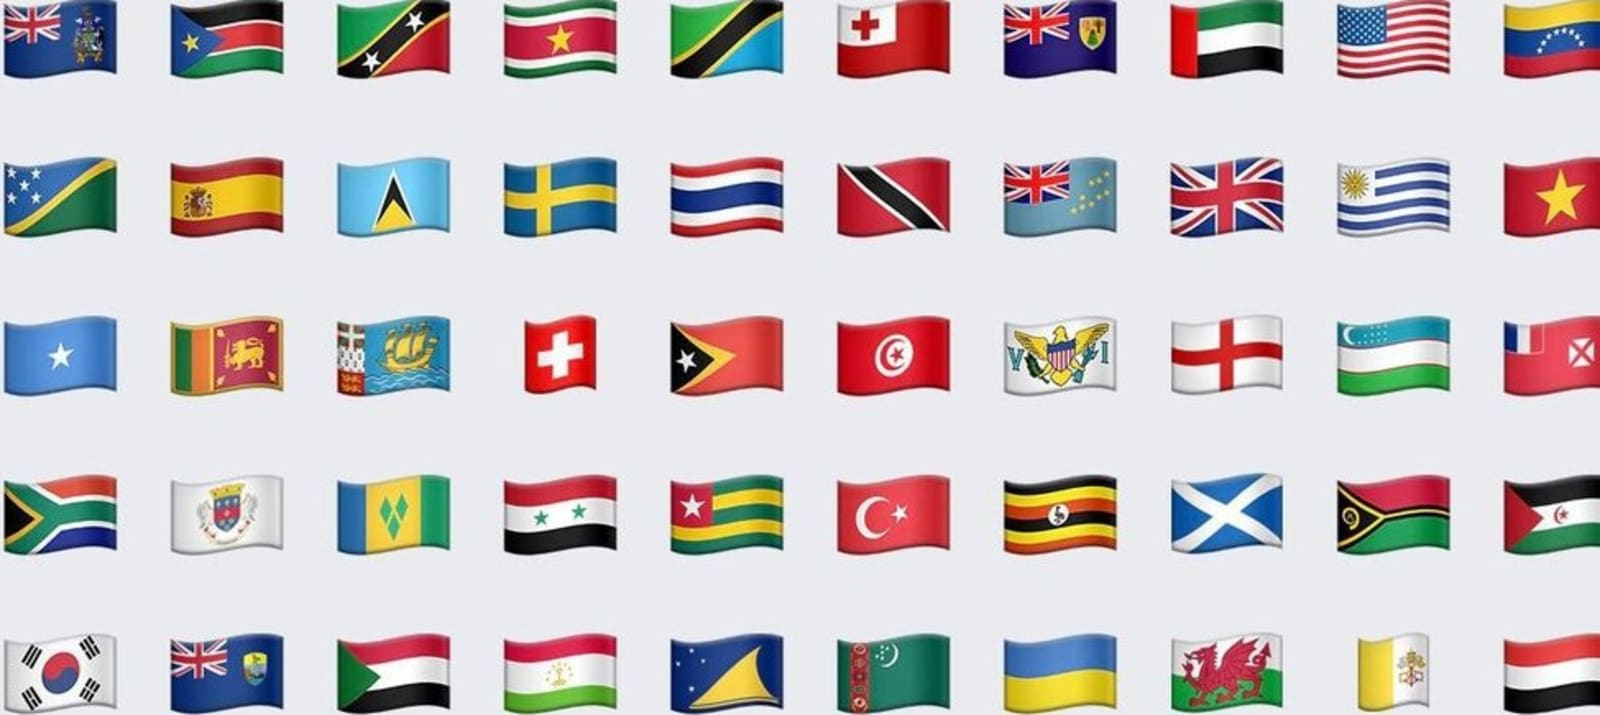 Apple removes Taiwan flag emoji from iOS in Hong Kong